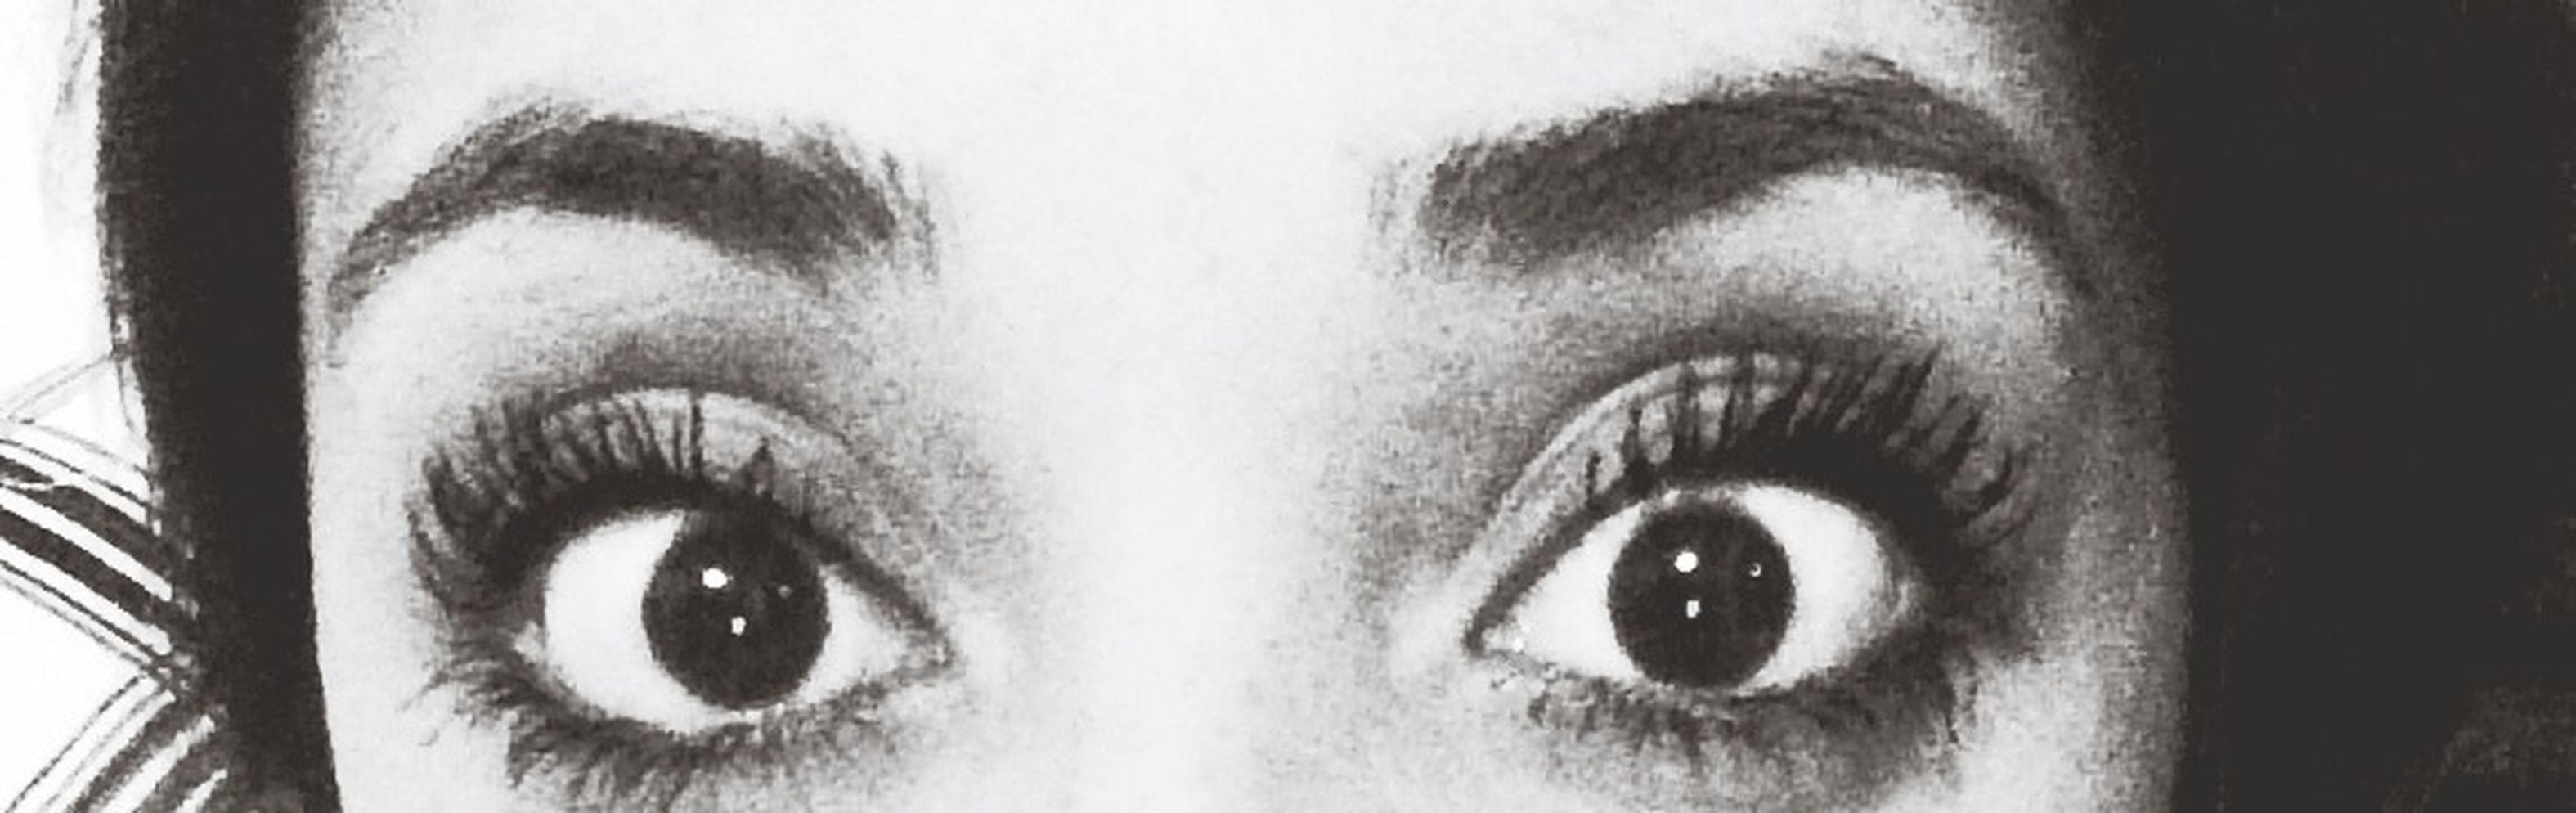 Olhos de ressaca DomCasmurro Eyes Friend Soul